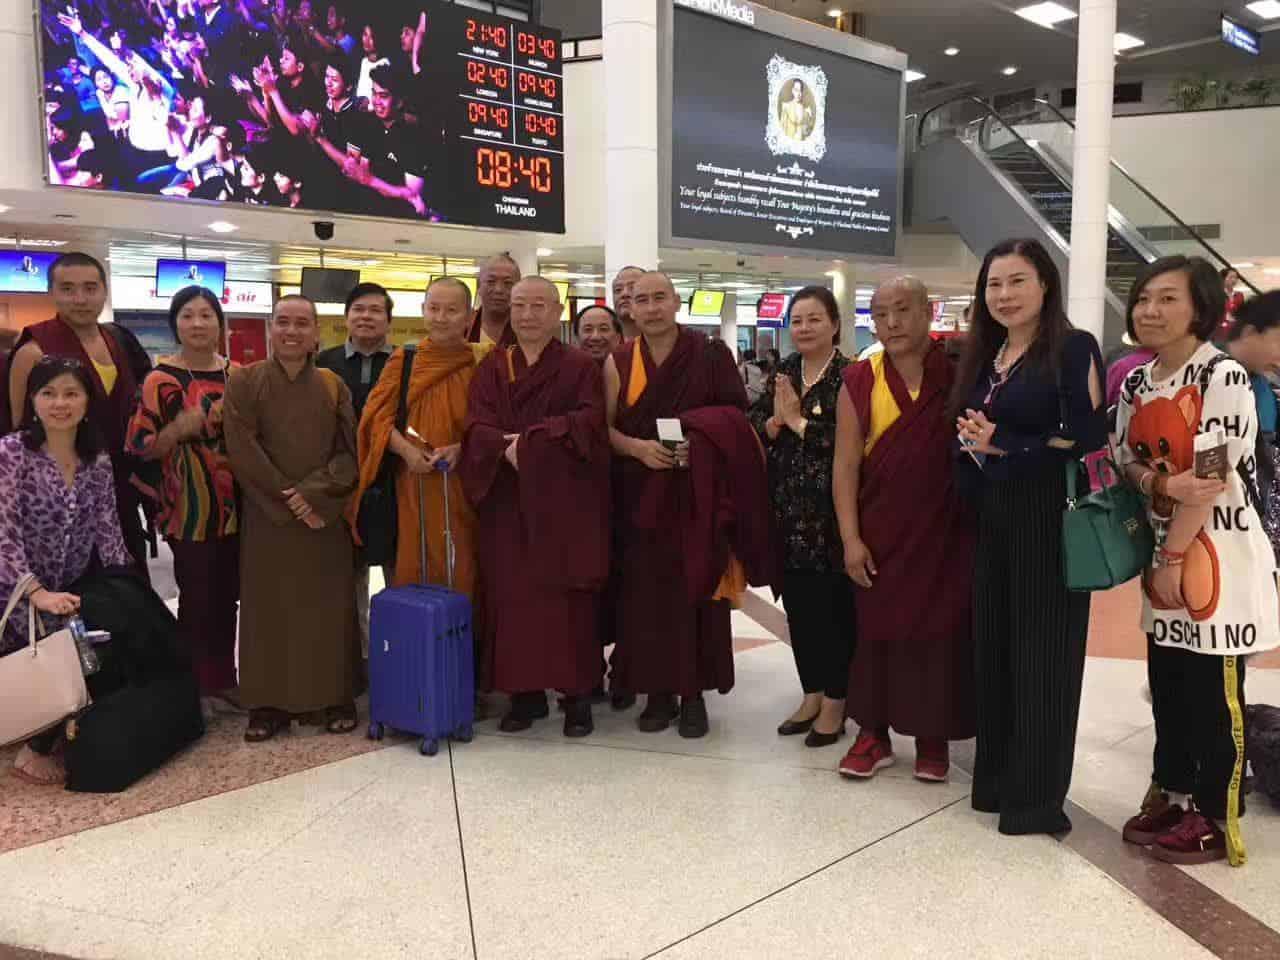 Gosok Rinpoche Thailand 2017 T009 09971c91bfa89ca33b18d056224fe99